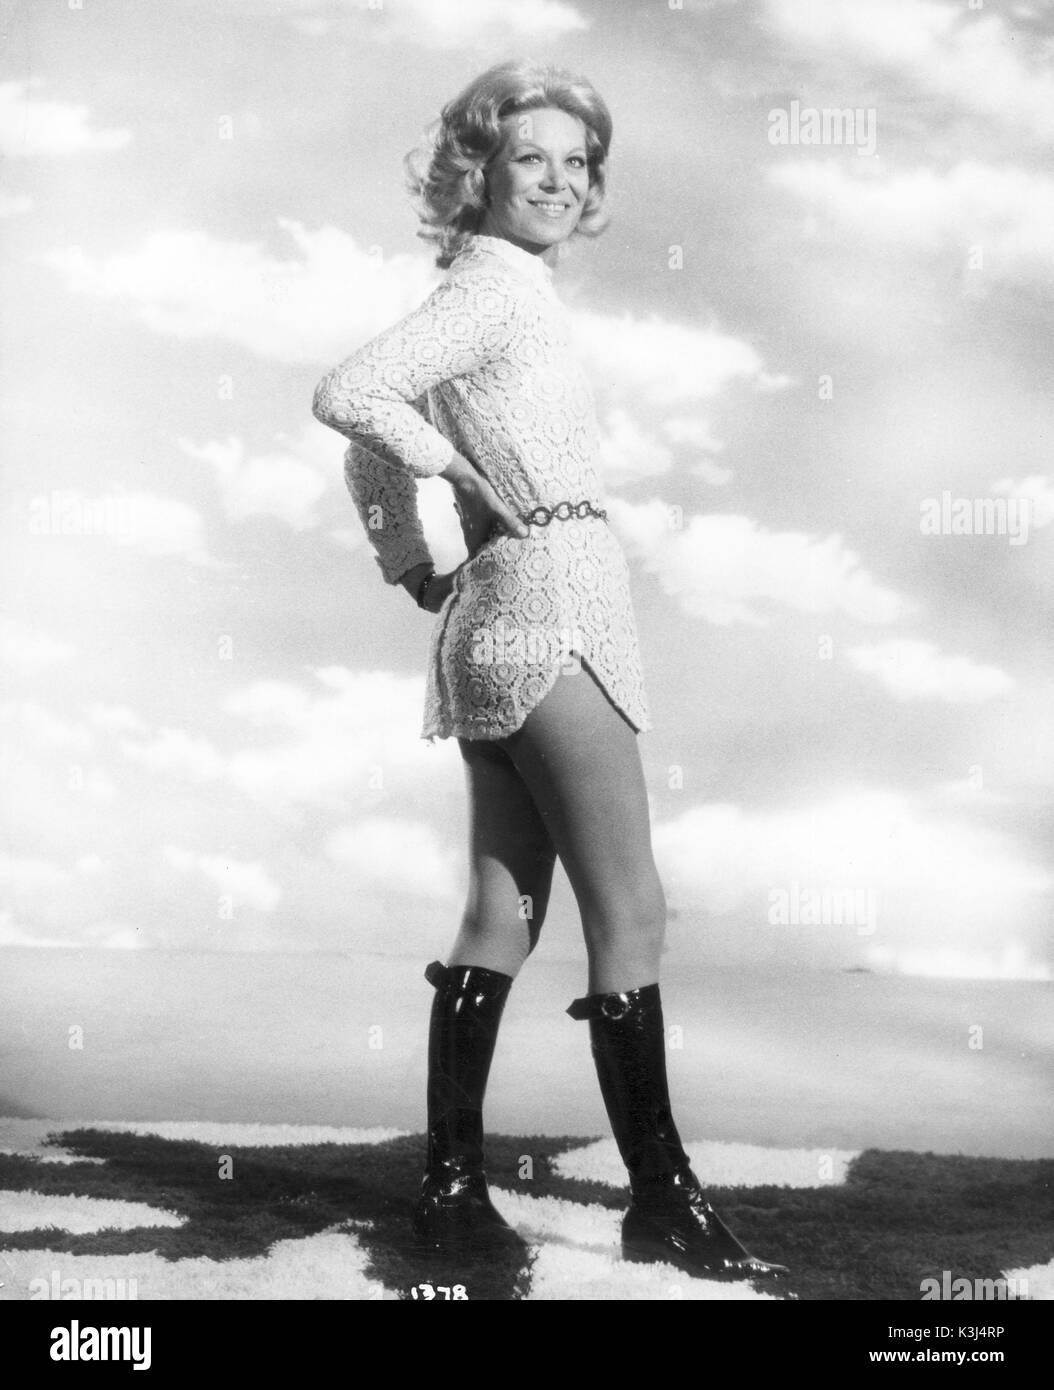 Forum on this topic: Anna Slotky, rachel-roberts-actress/